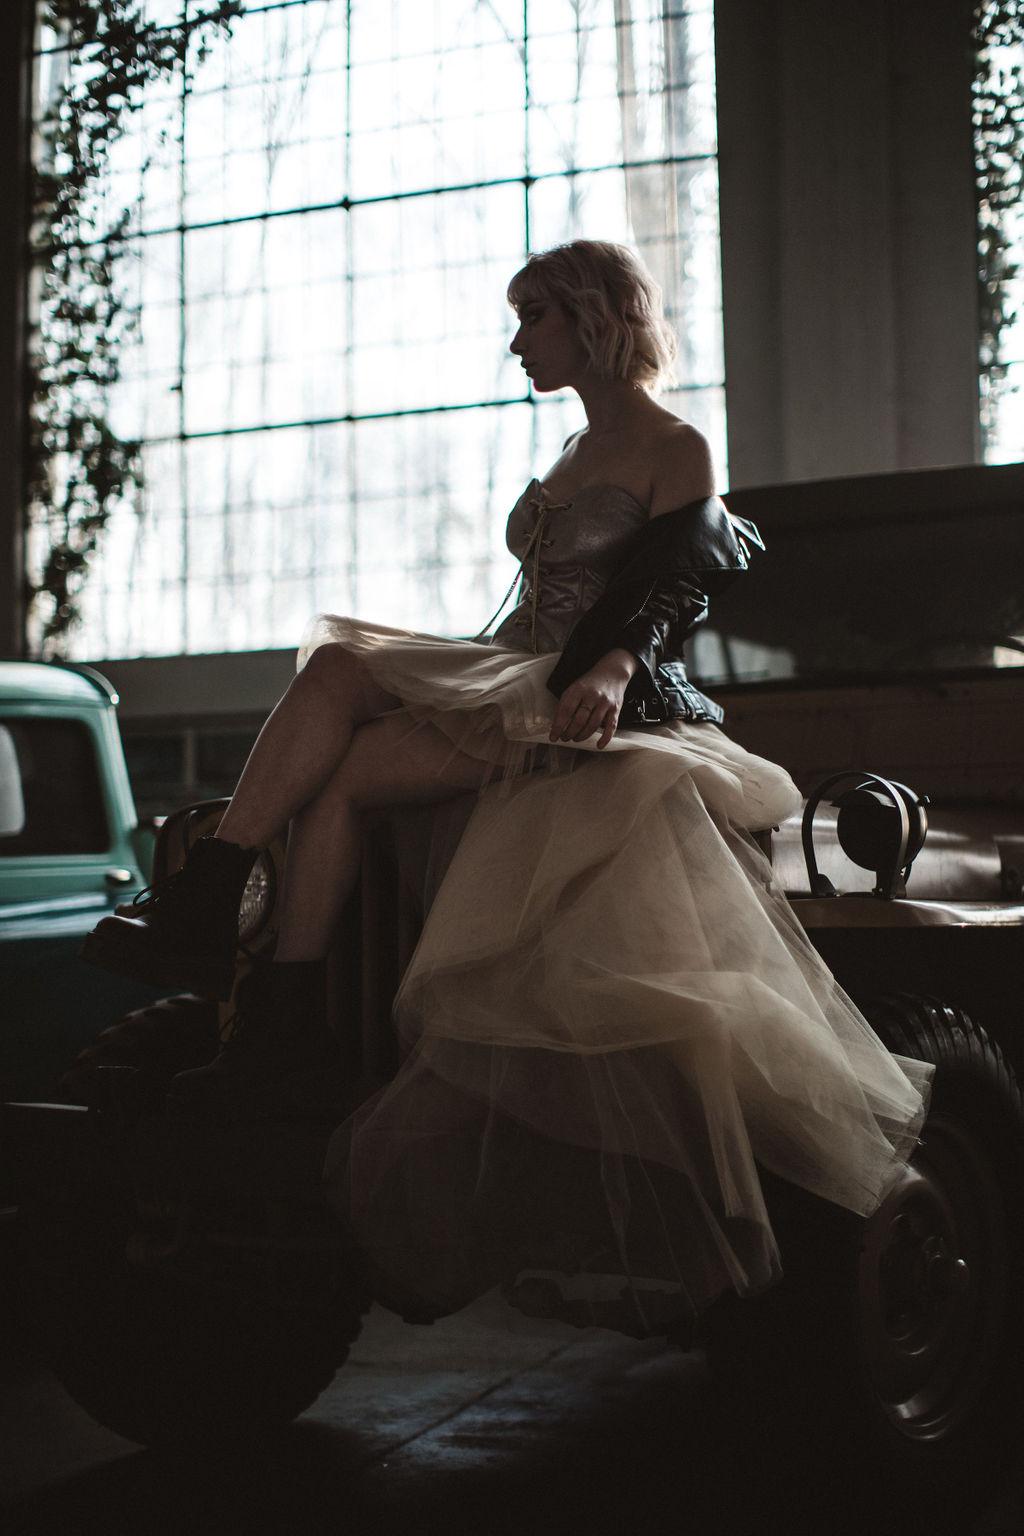 modern industrial wedding - alternative wedding - unconventional wedding - edgy wedding - artistic bridal photoshoot